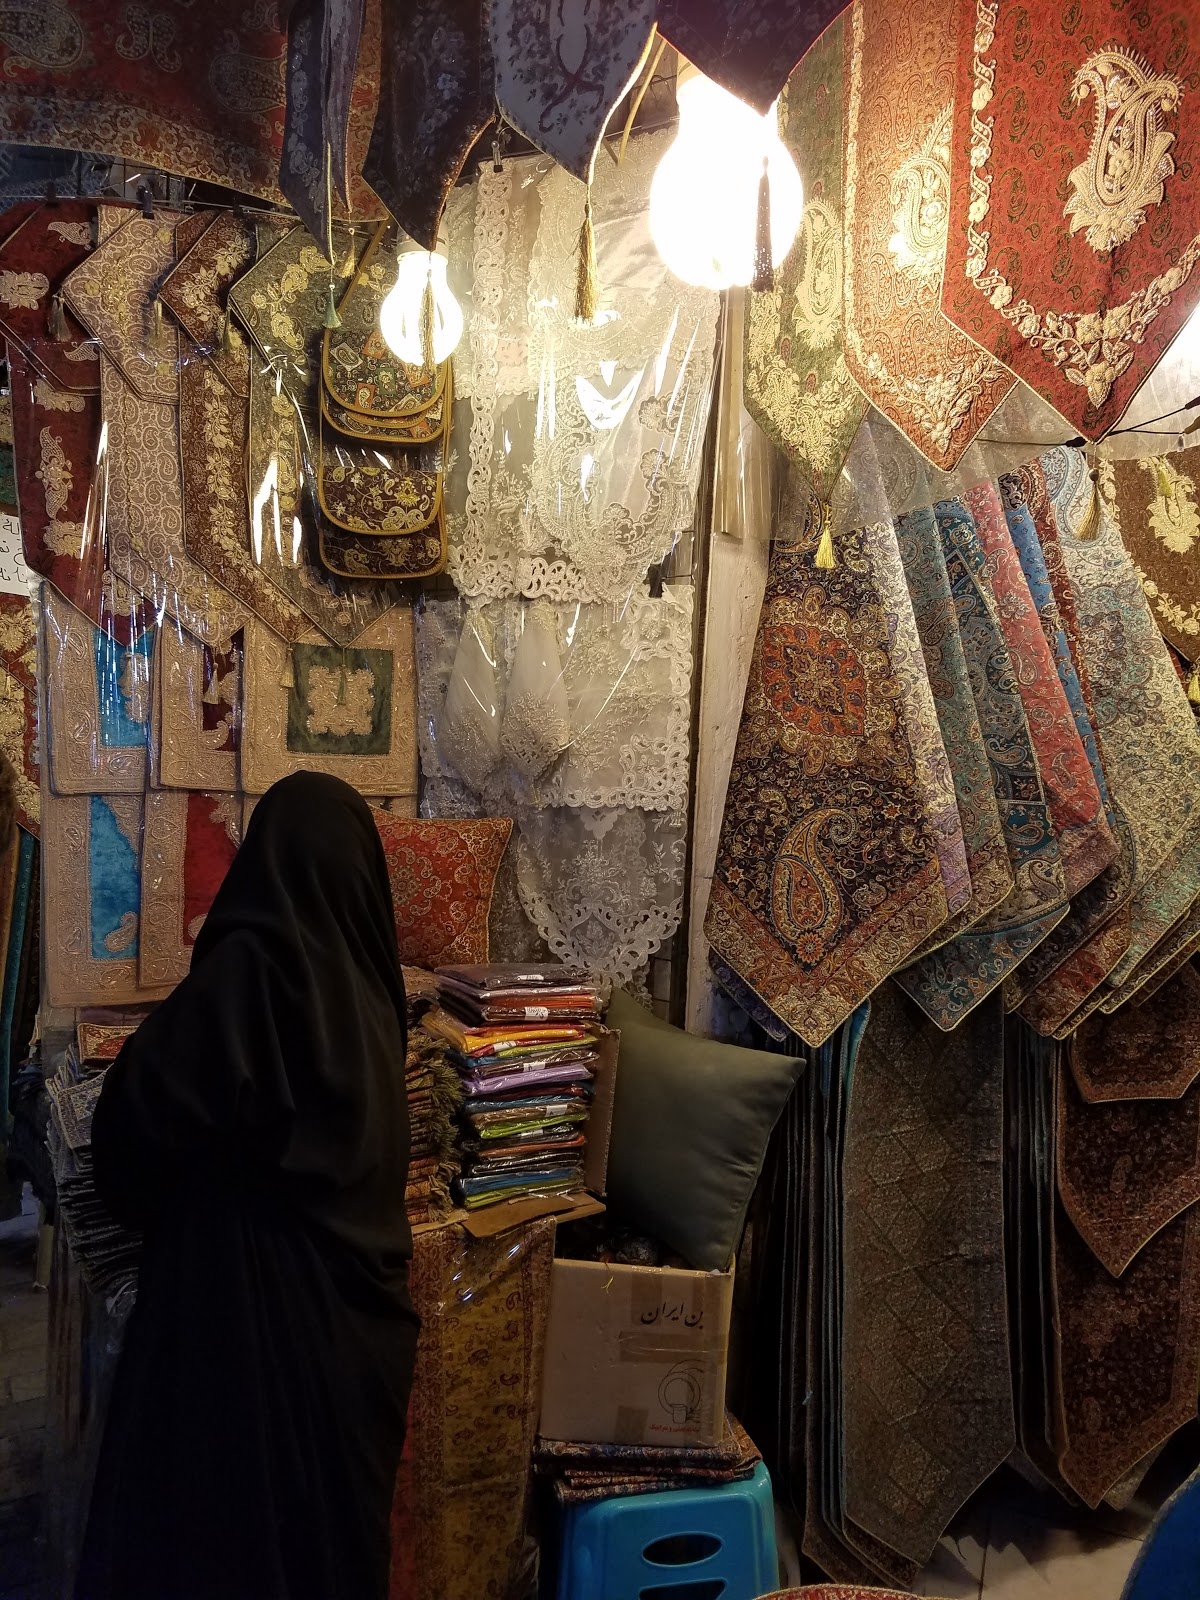 Termeh Bazaar, تهران, جمهوری اسلامی ایران